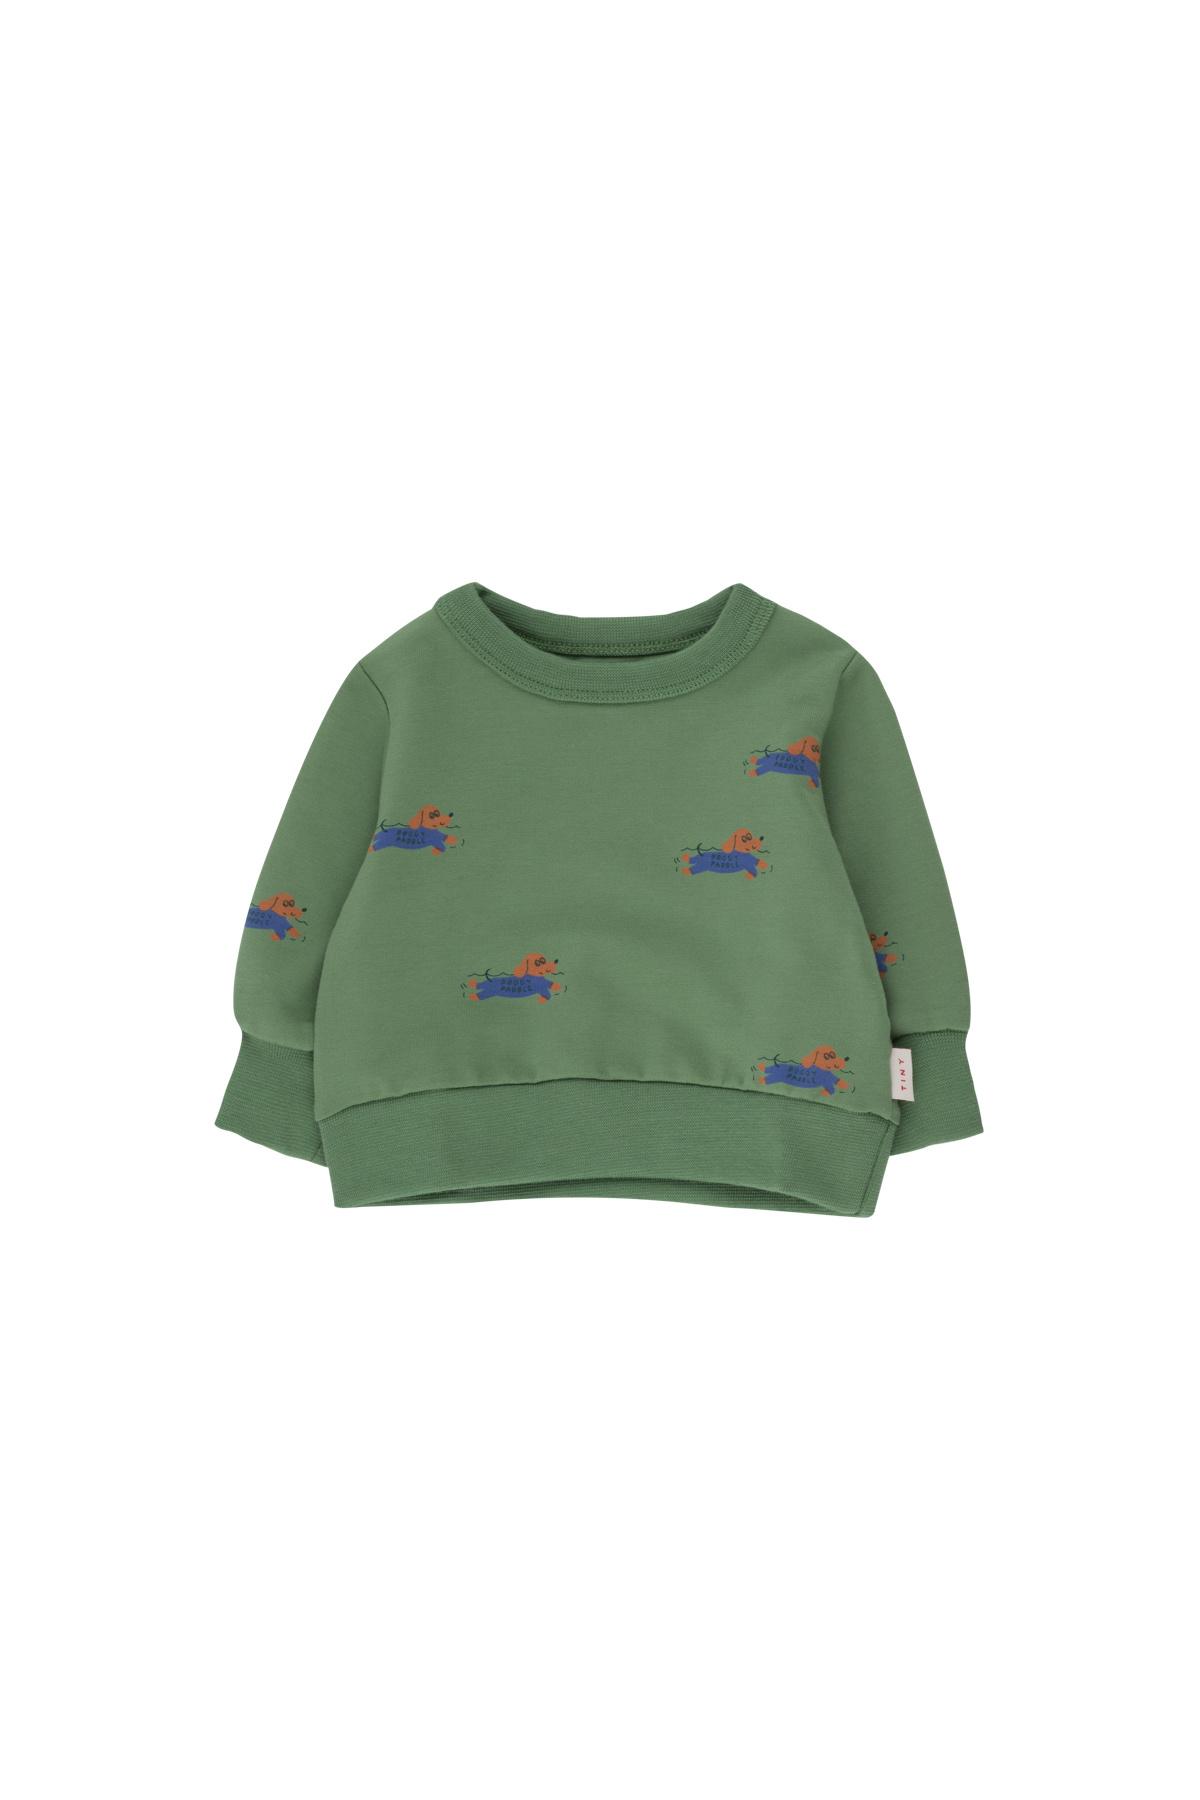 Doggy paddle sweatshirt - Green / Iris Blue-1